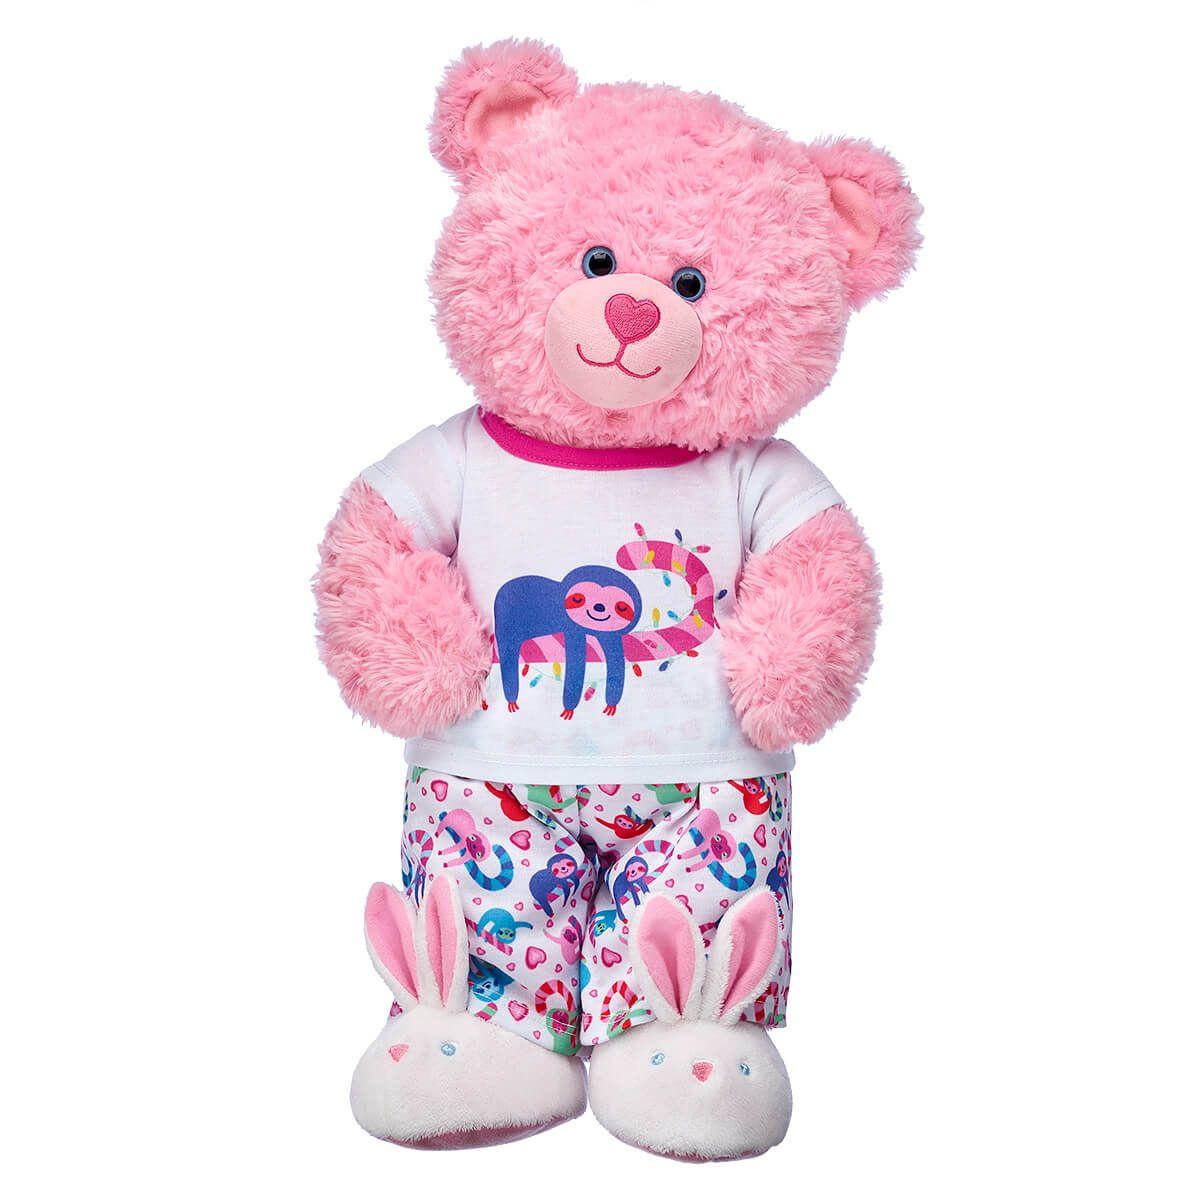 Stuffed Animals & Teddy Bears 16 in. Build A Bear Workshop Slow Cute Sloth  Plush Toys & Games